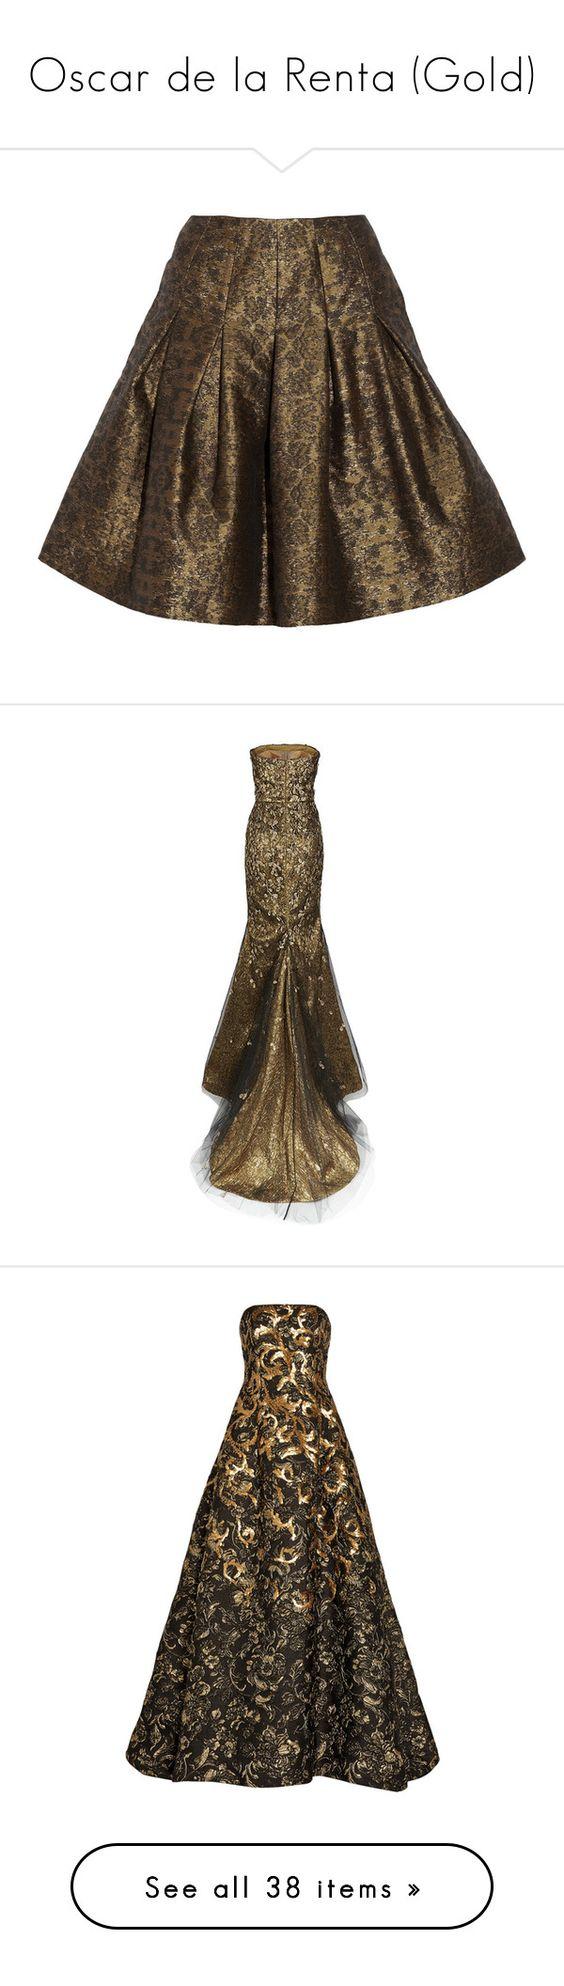 """Oscar de la Renta (Gold)"" by kari-c ❤ liked on Polyvore featuring skirts, oscar de la renta, metallic, pleated skirts, metallic pleated skirt, knee length pleated skirt, brown skirt, metallic skirts, dresses and gowns"